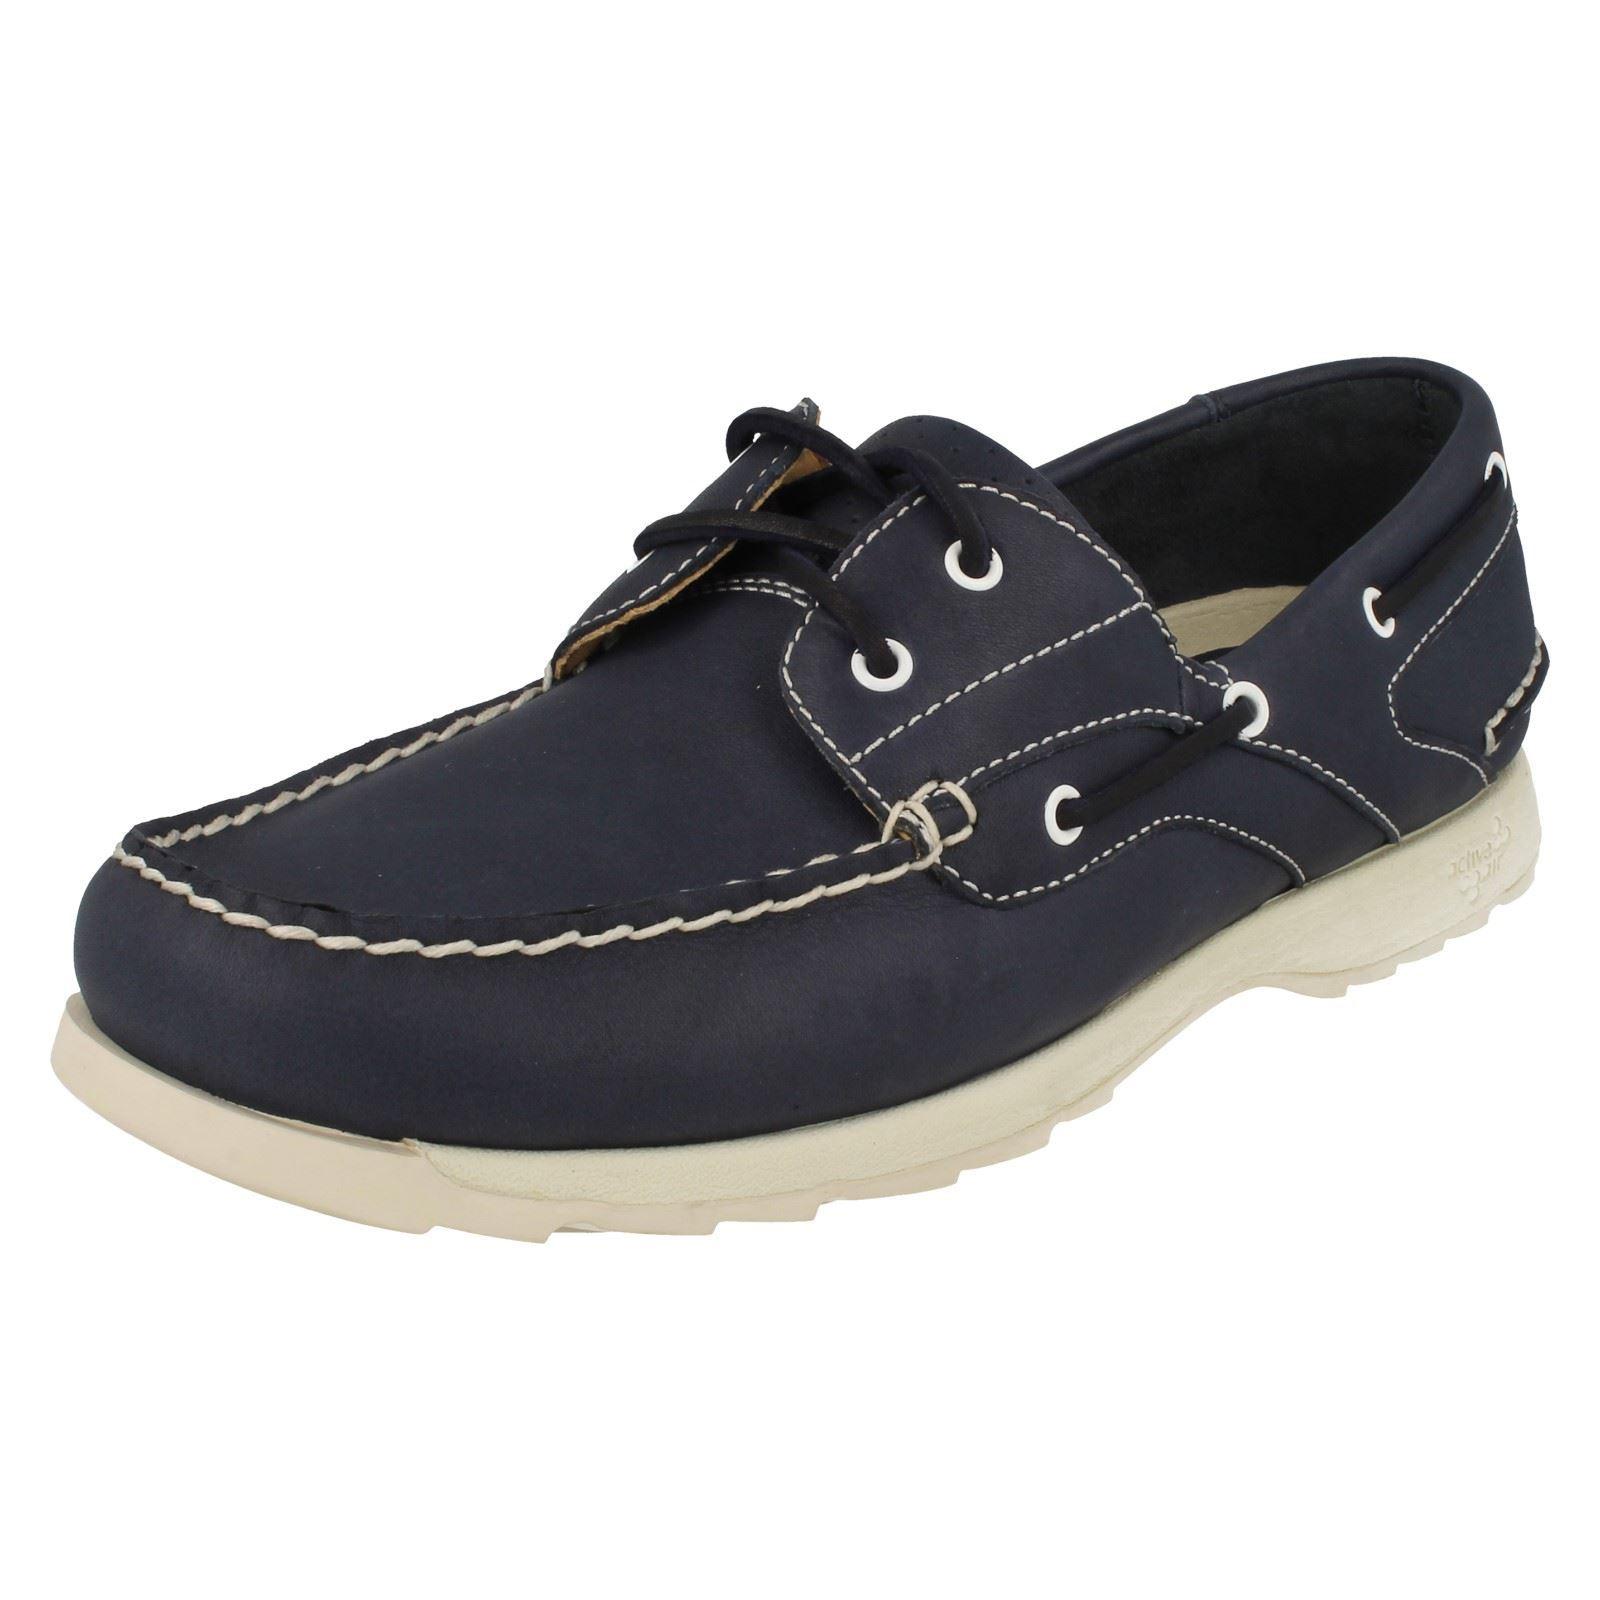 Zapatos para Hombre Clarks Cubierta River Rush